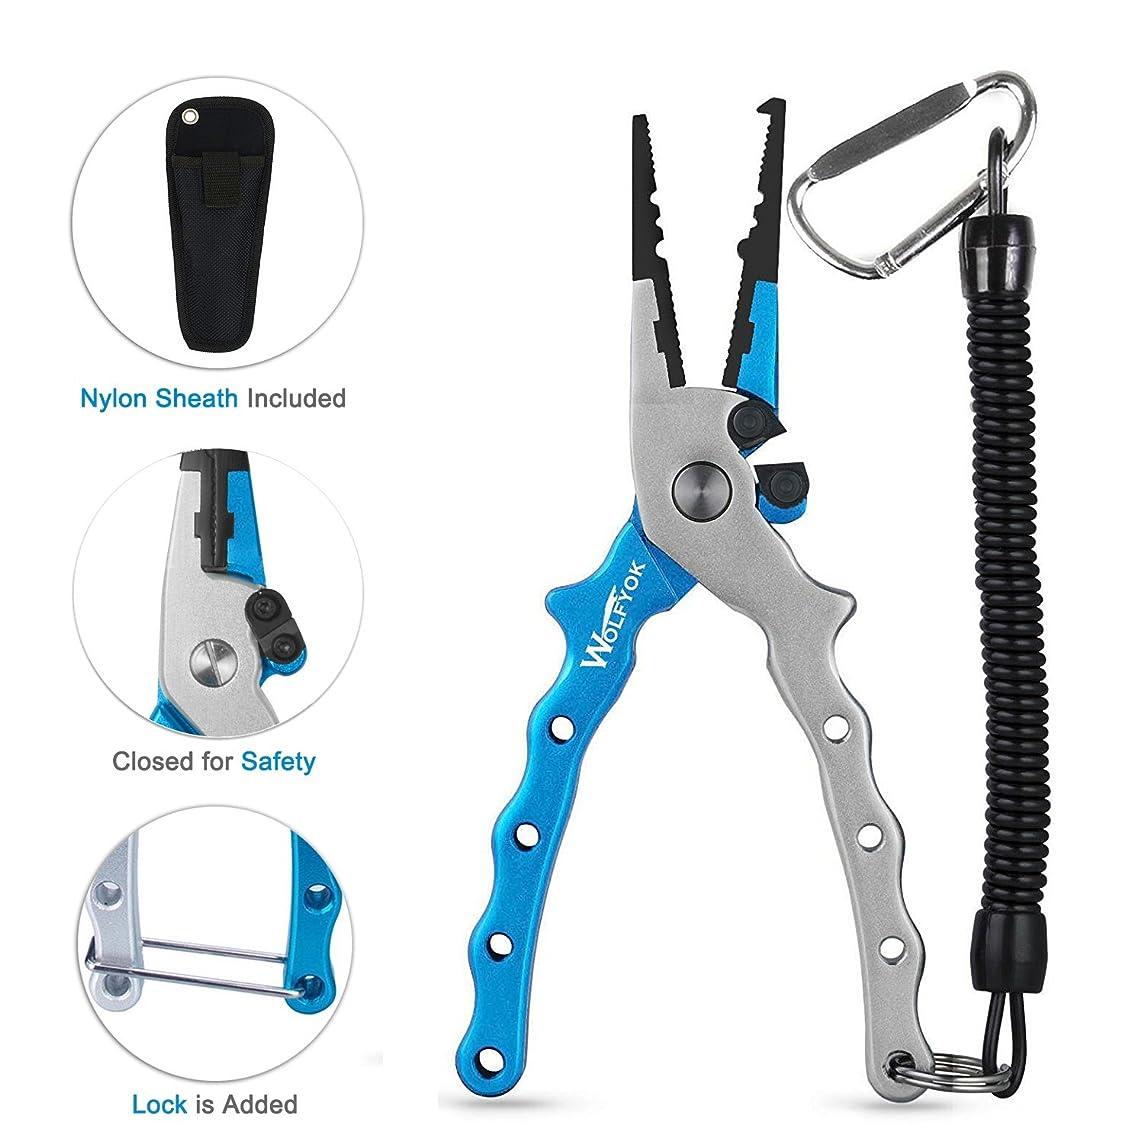 Wolfyok Aluminum Fishing Pliers, Stainless Steel Hook Removers Pliers, Rustproof Saltwater Split Ring Tool & Braid Line Cutters with Sheath and Lanyard